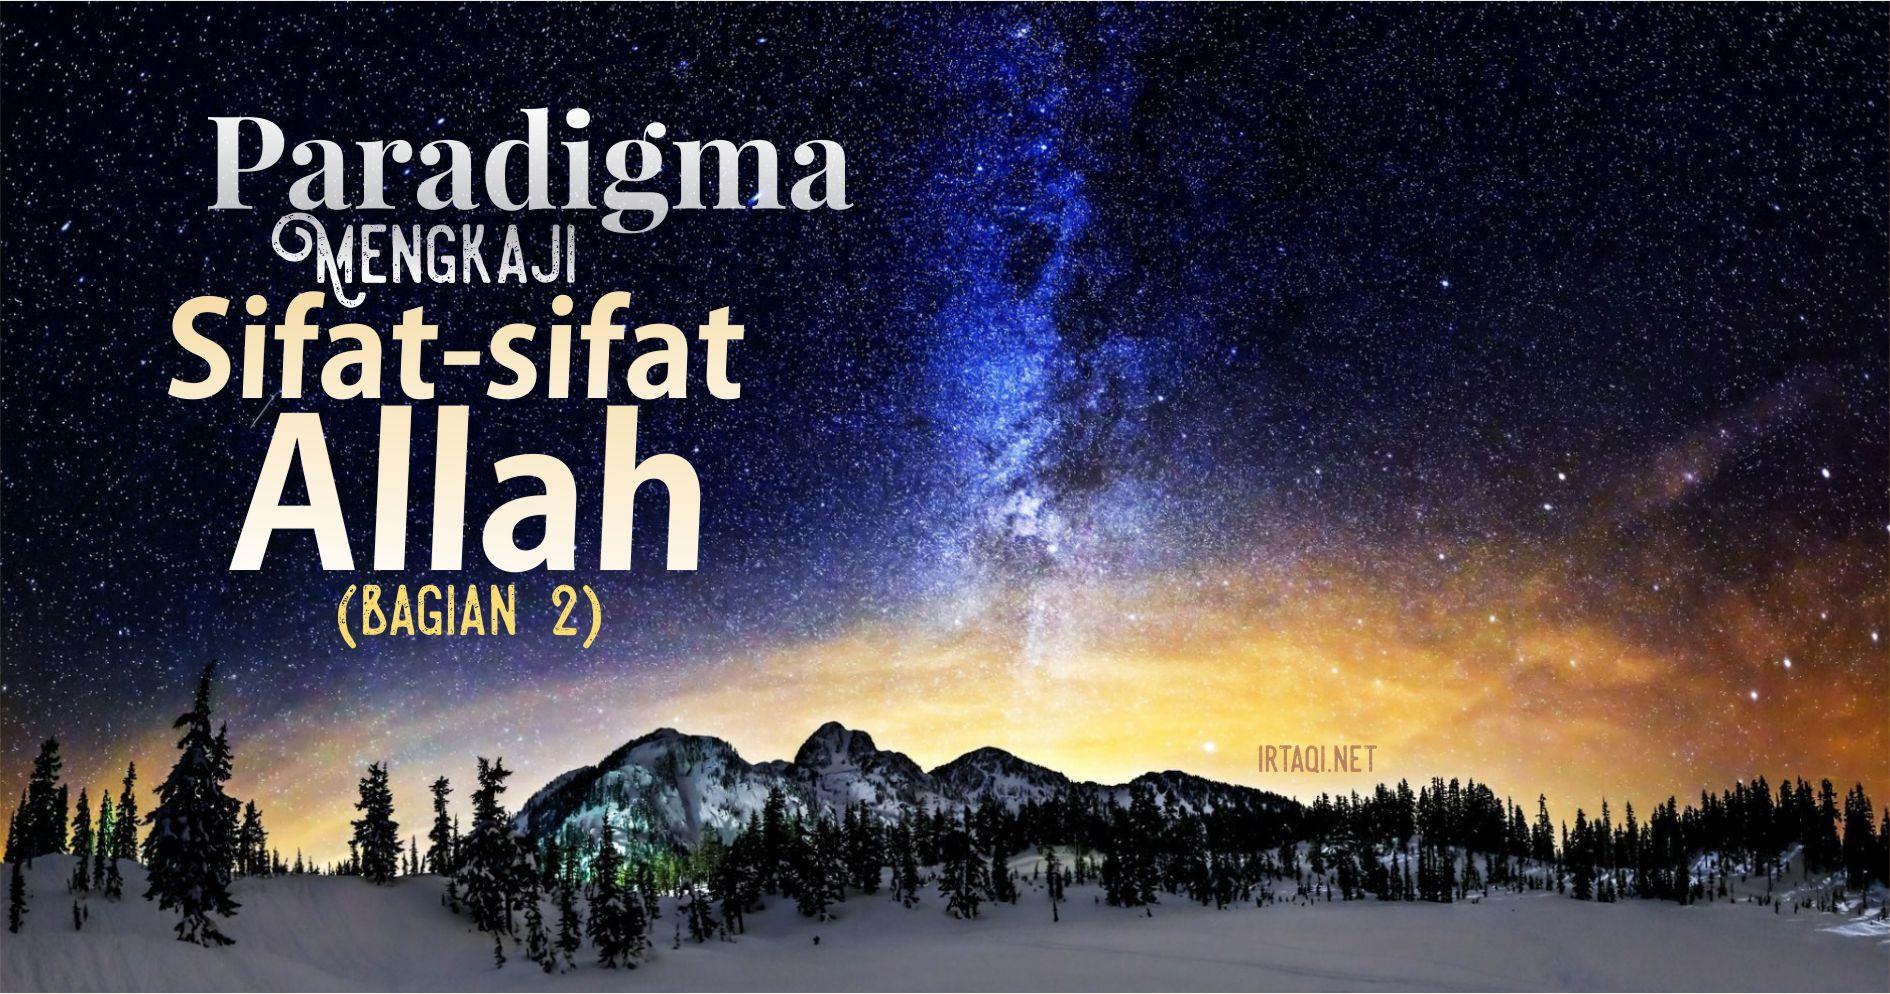 PARADIGMA MENGKAJI SIFAT-SIFAT ALLAH (2)